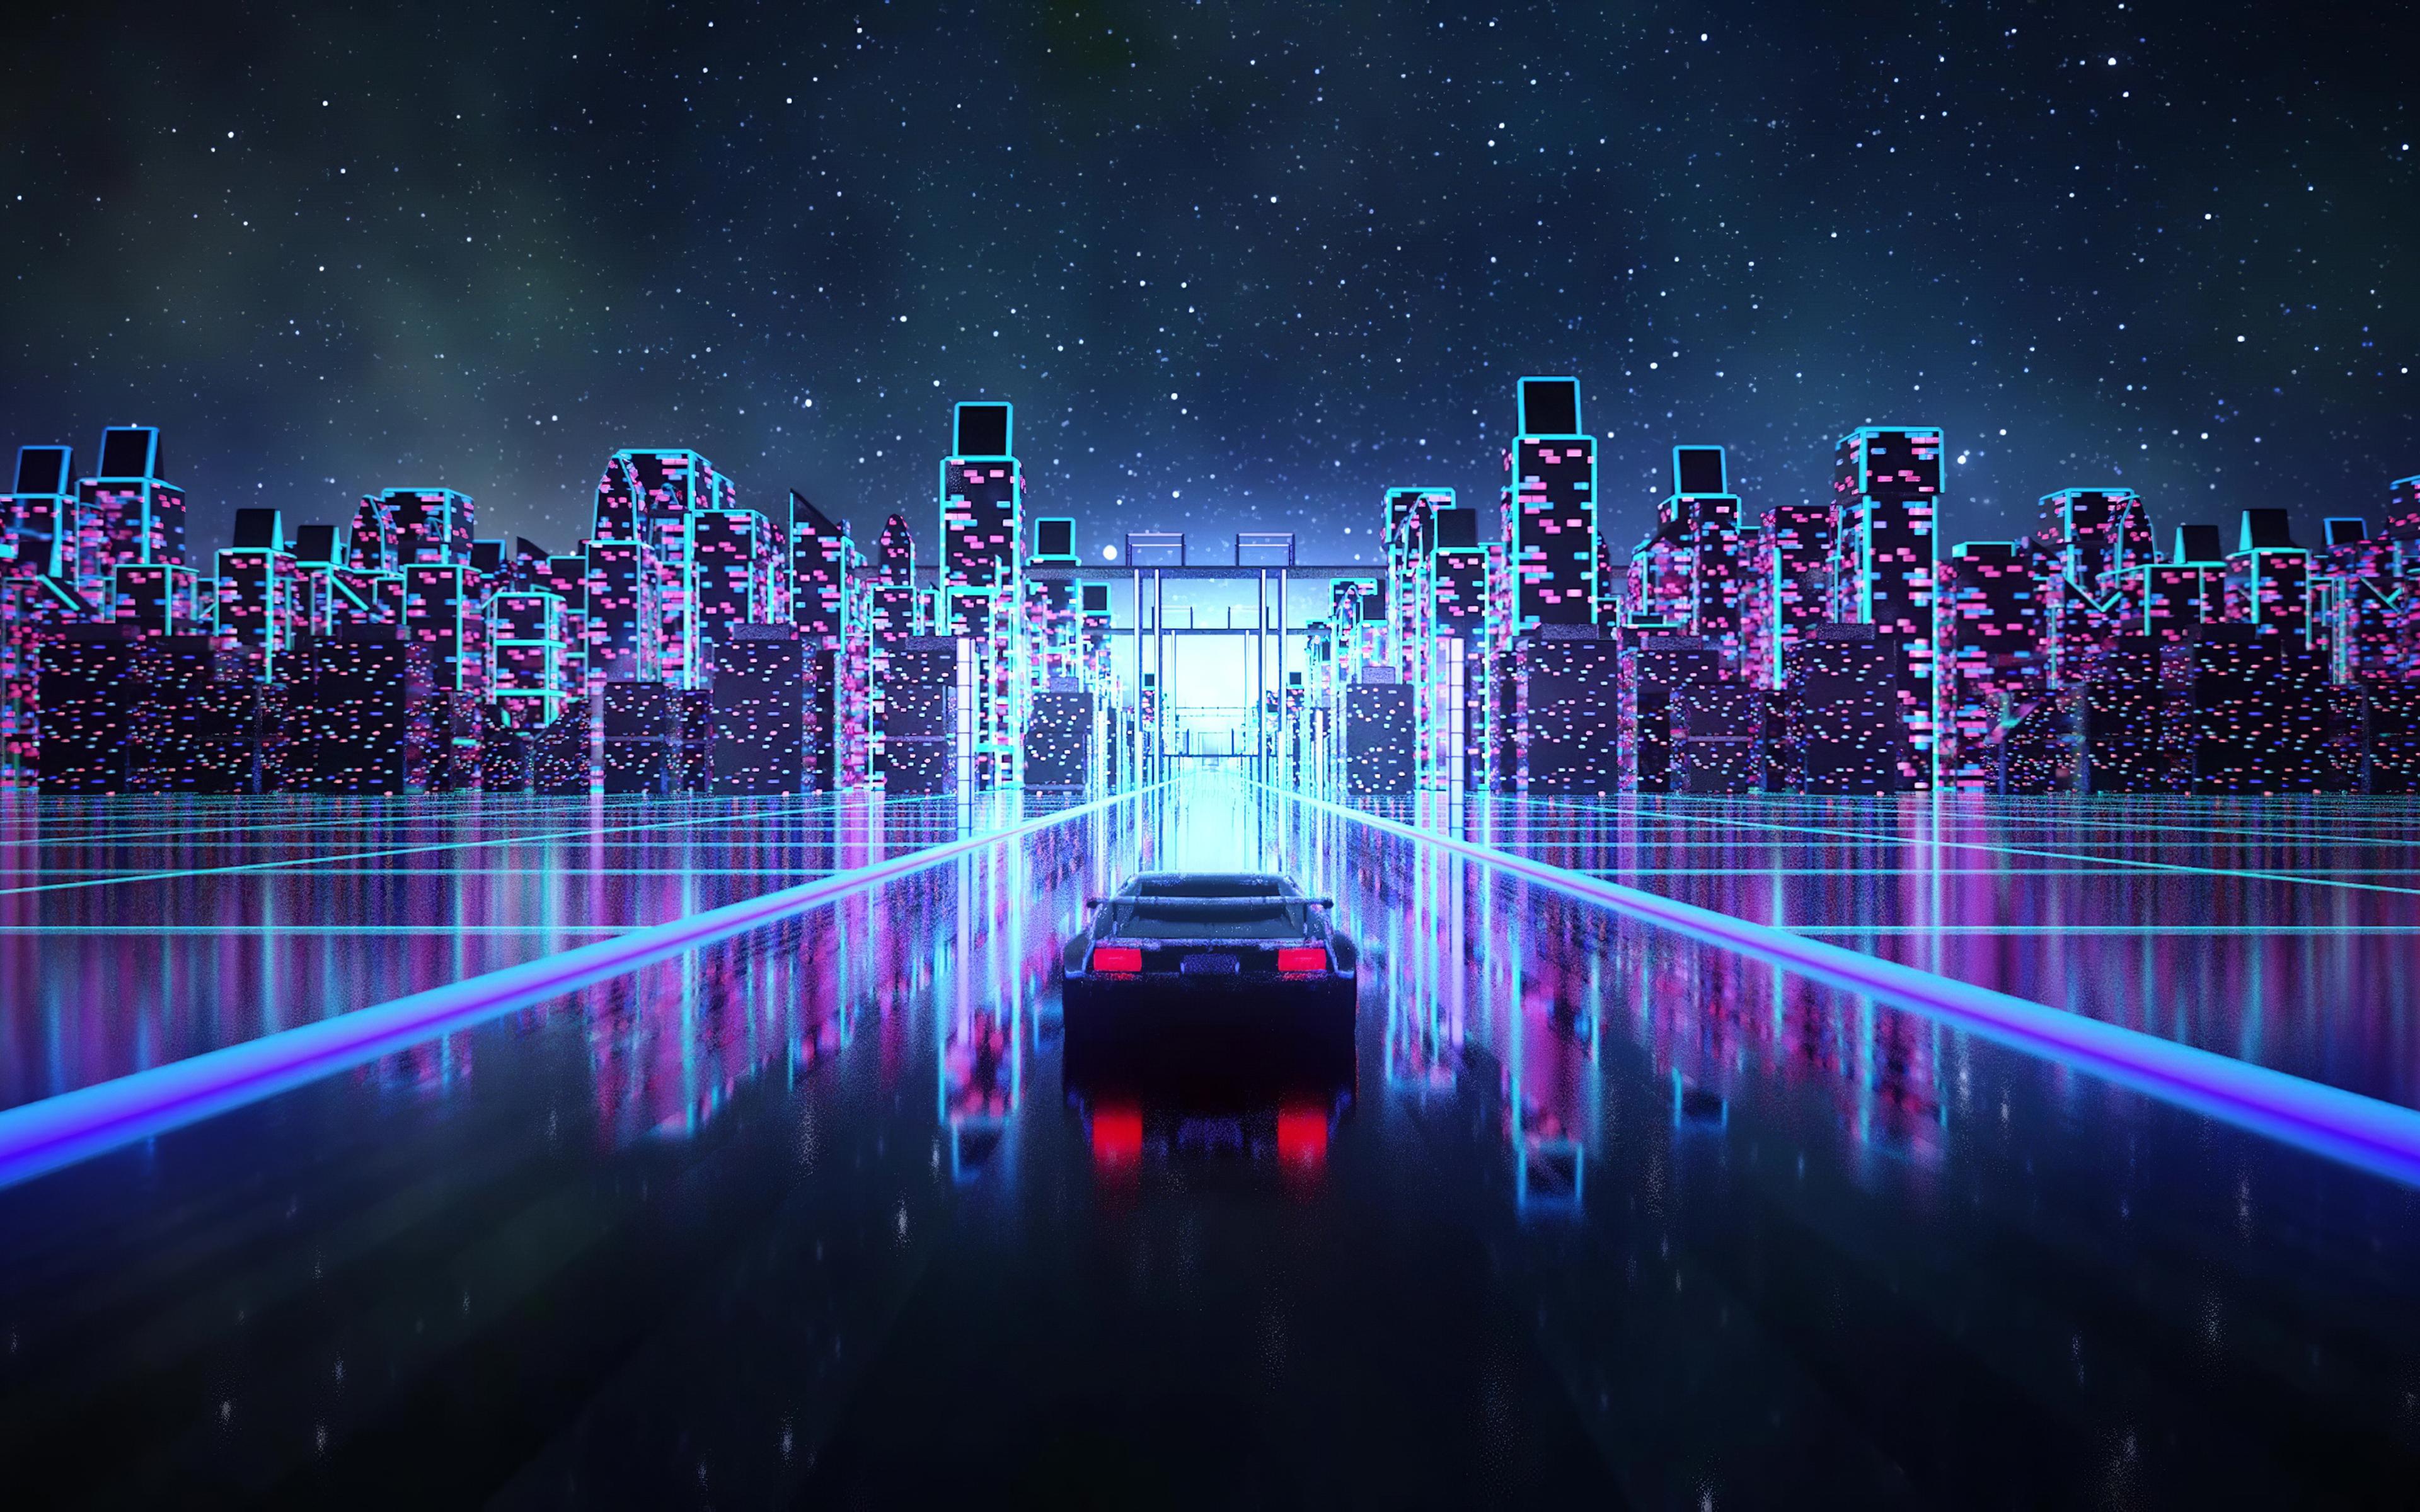 cyber-outrun-vaporwave-synth-retro-car-4k-m6.jpg